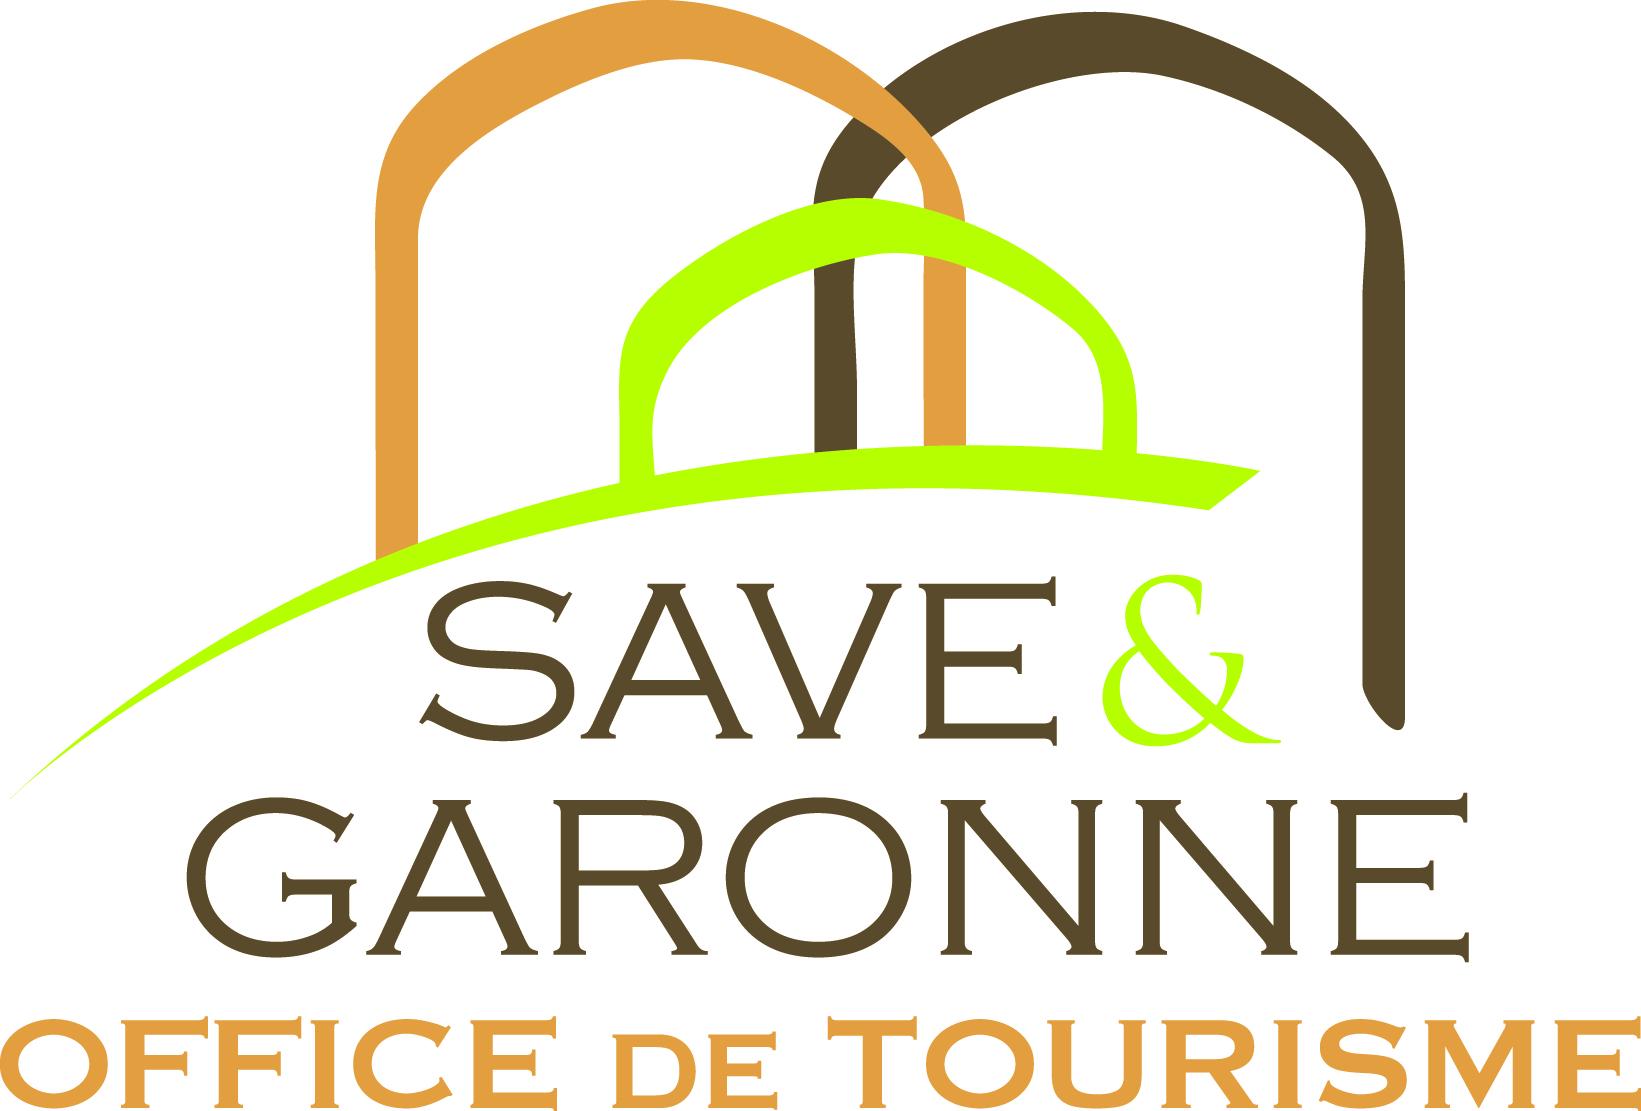 Office de Tourisme Save & Garonne